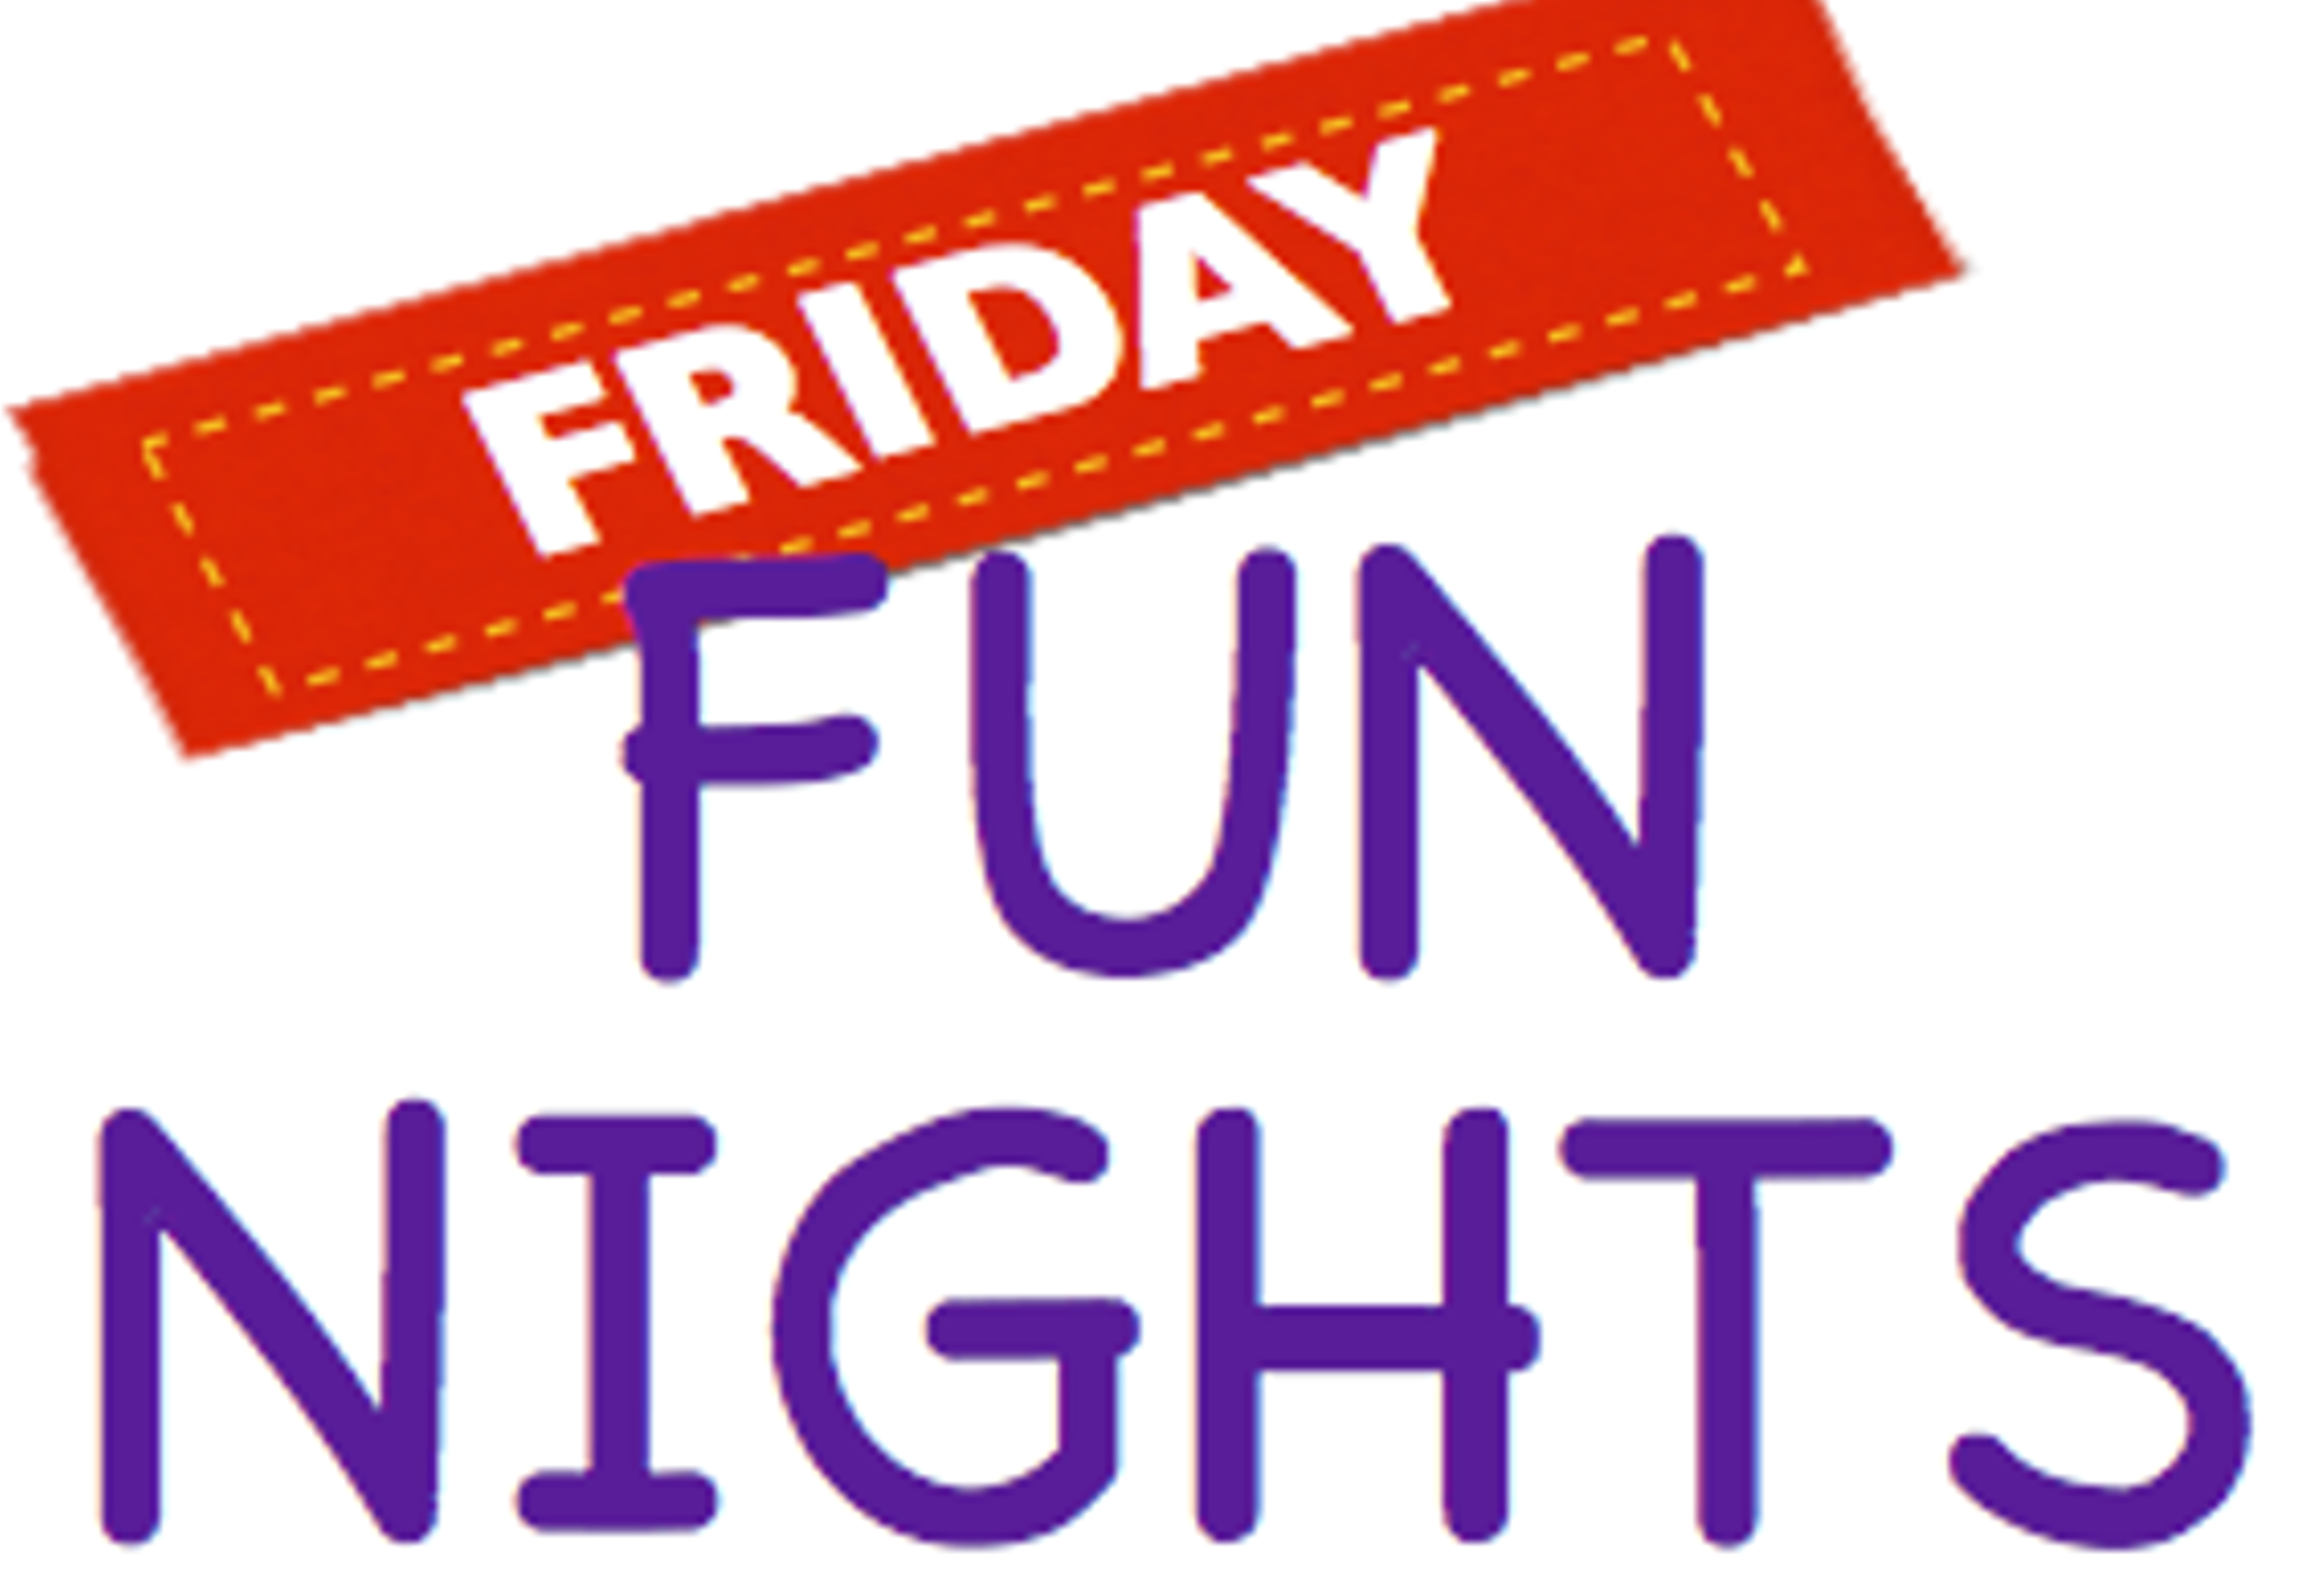 Friday Fun Nights image.